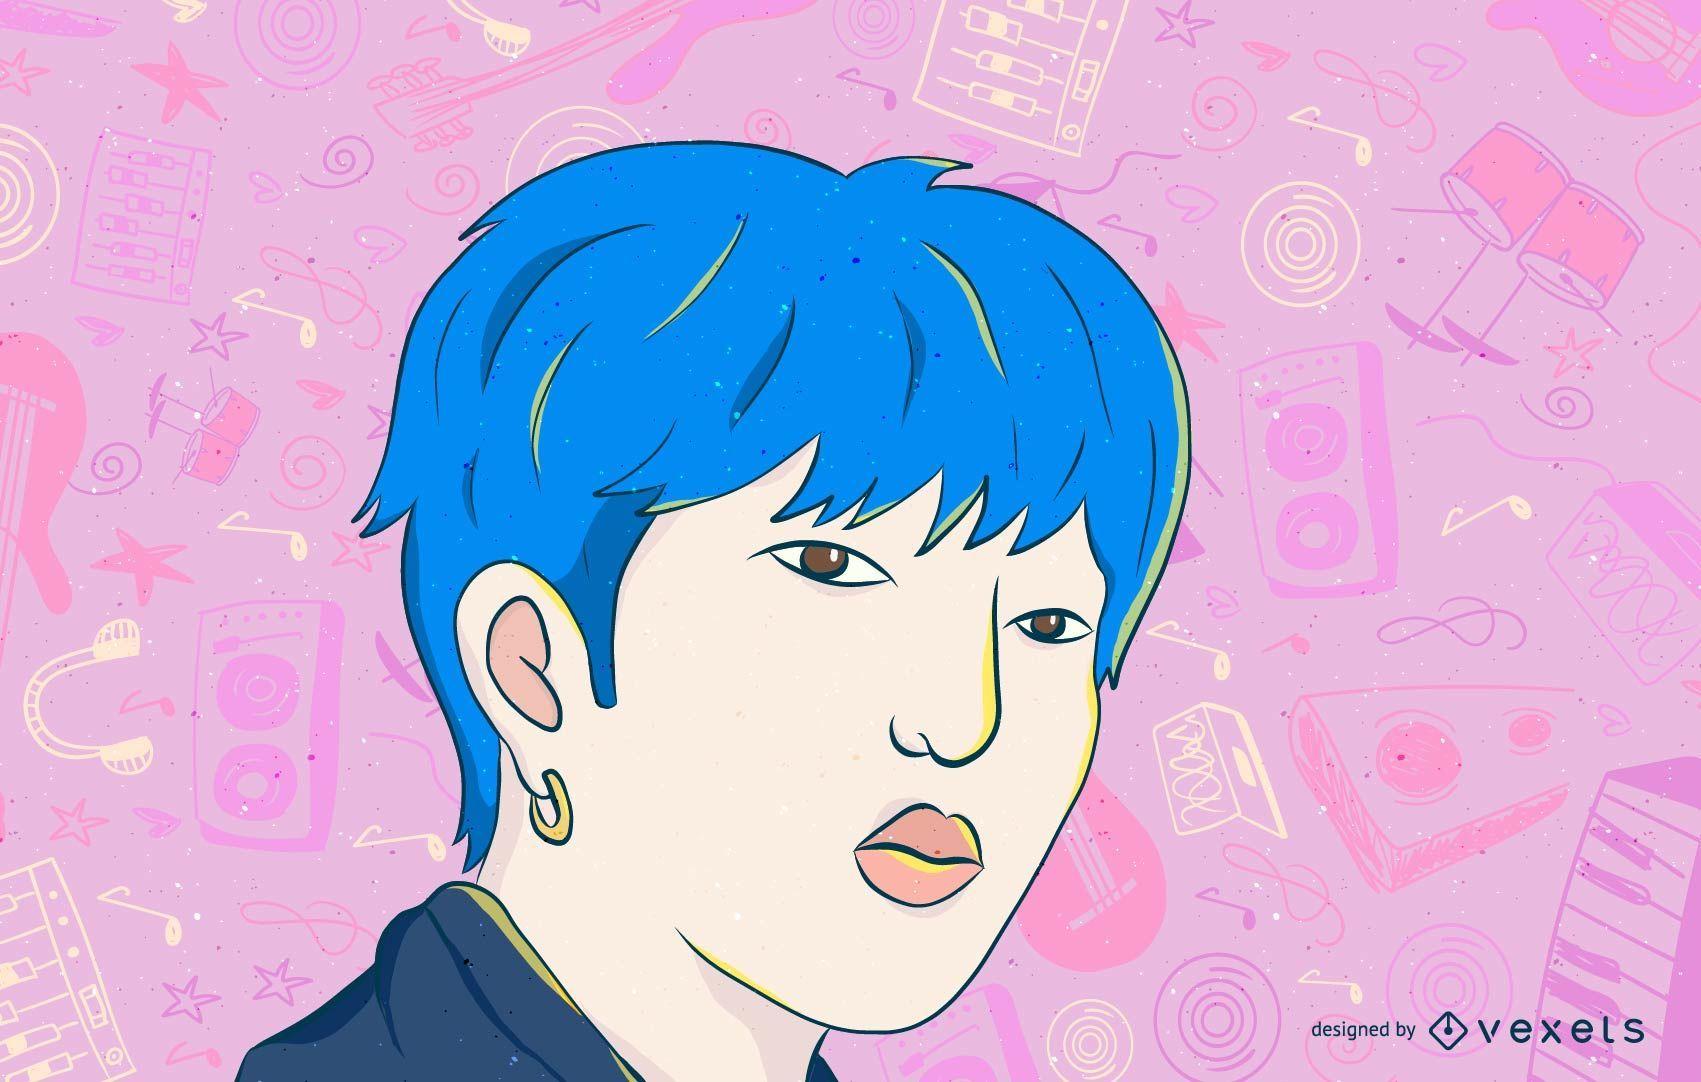 Dibujos animados de cantante pop coreano